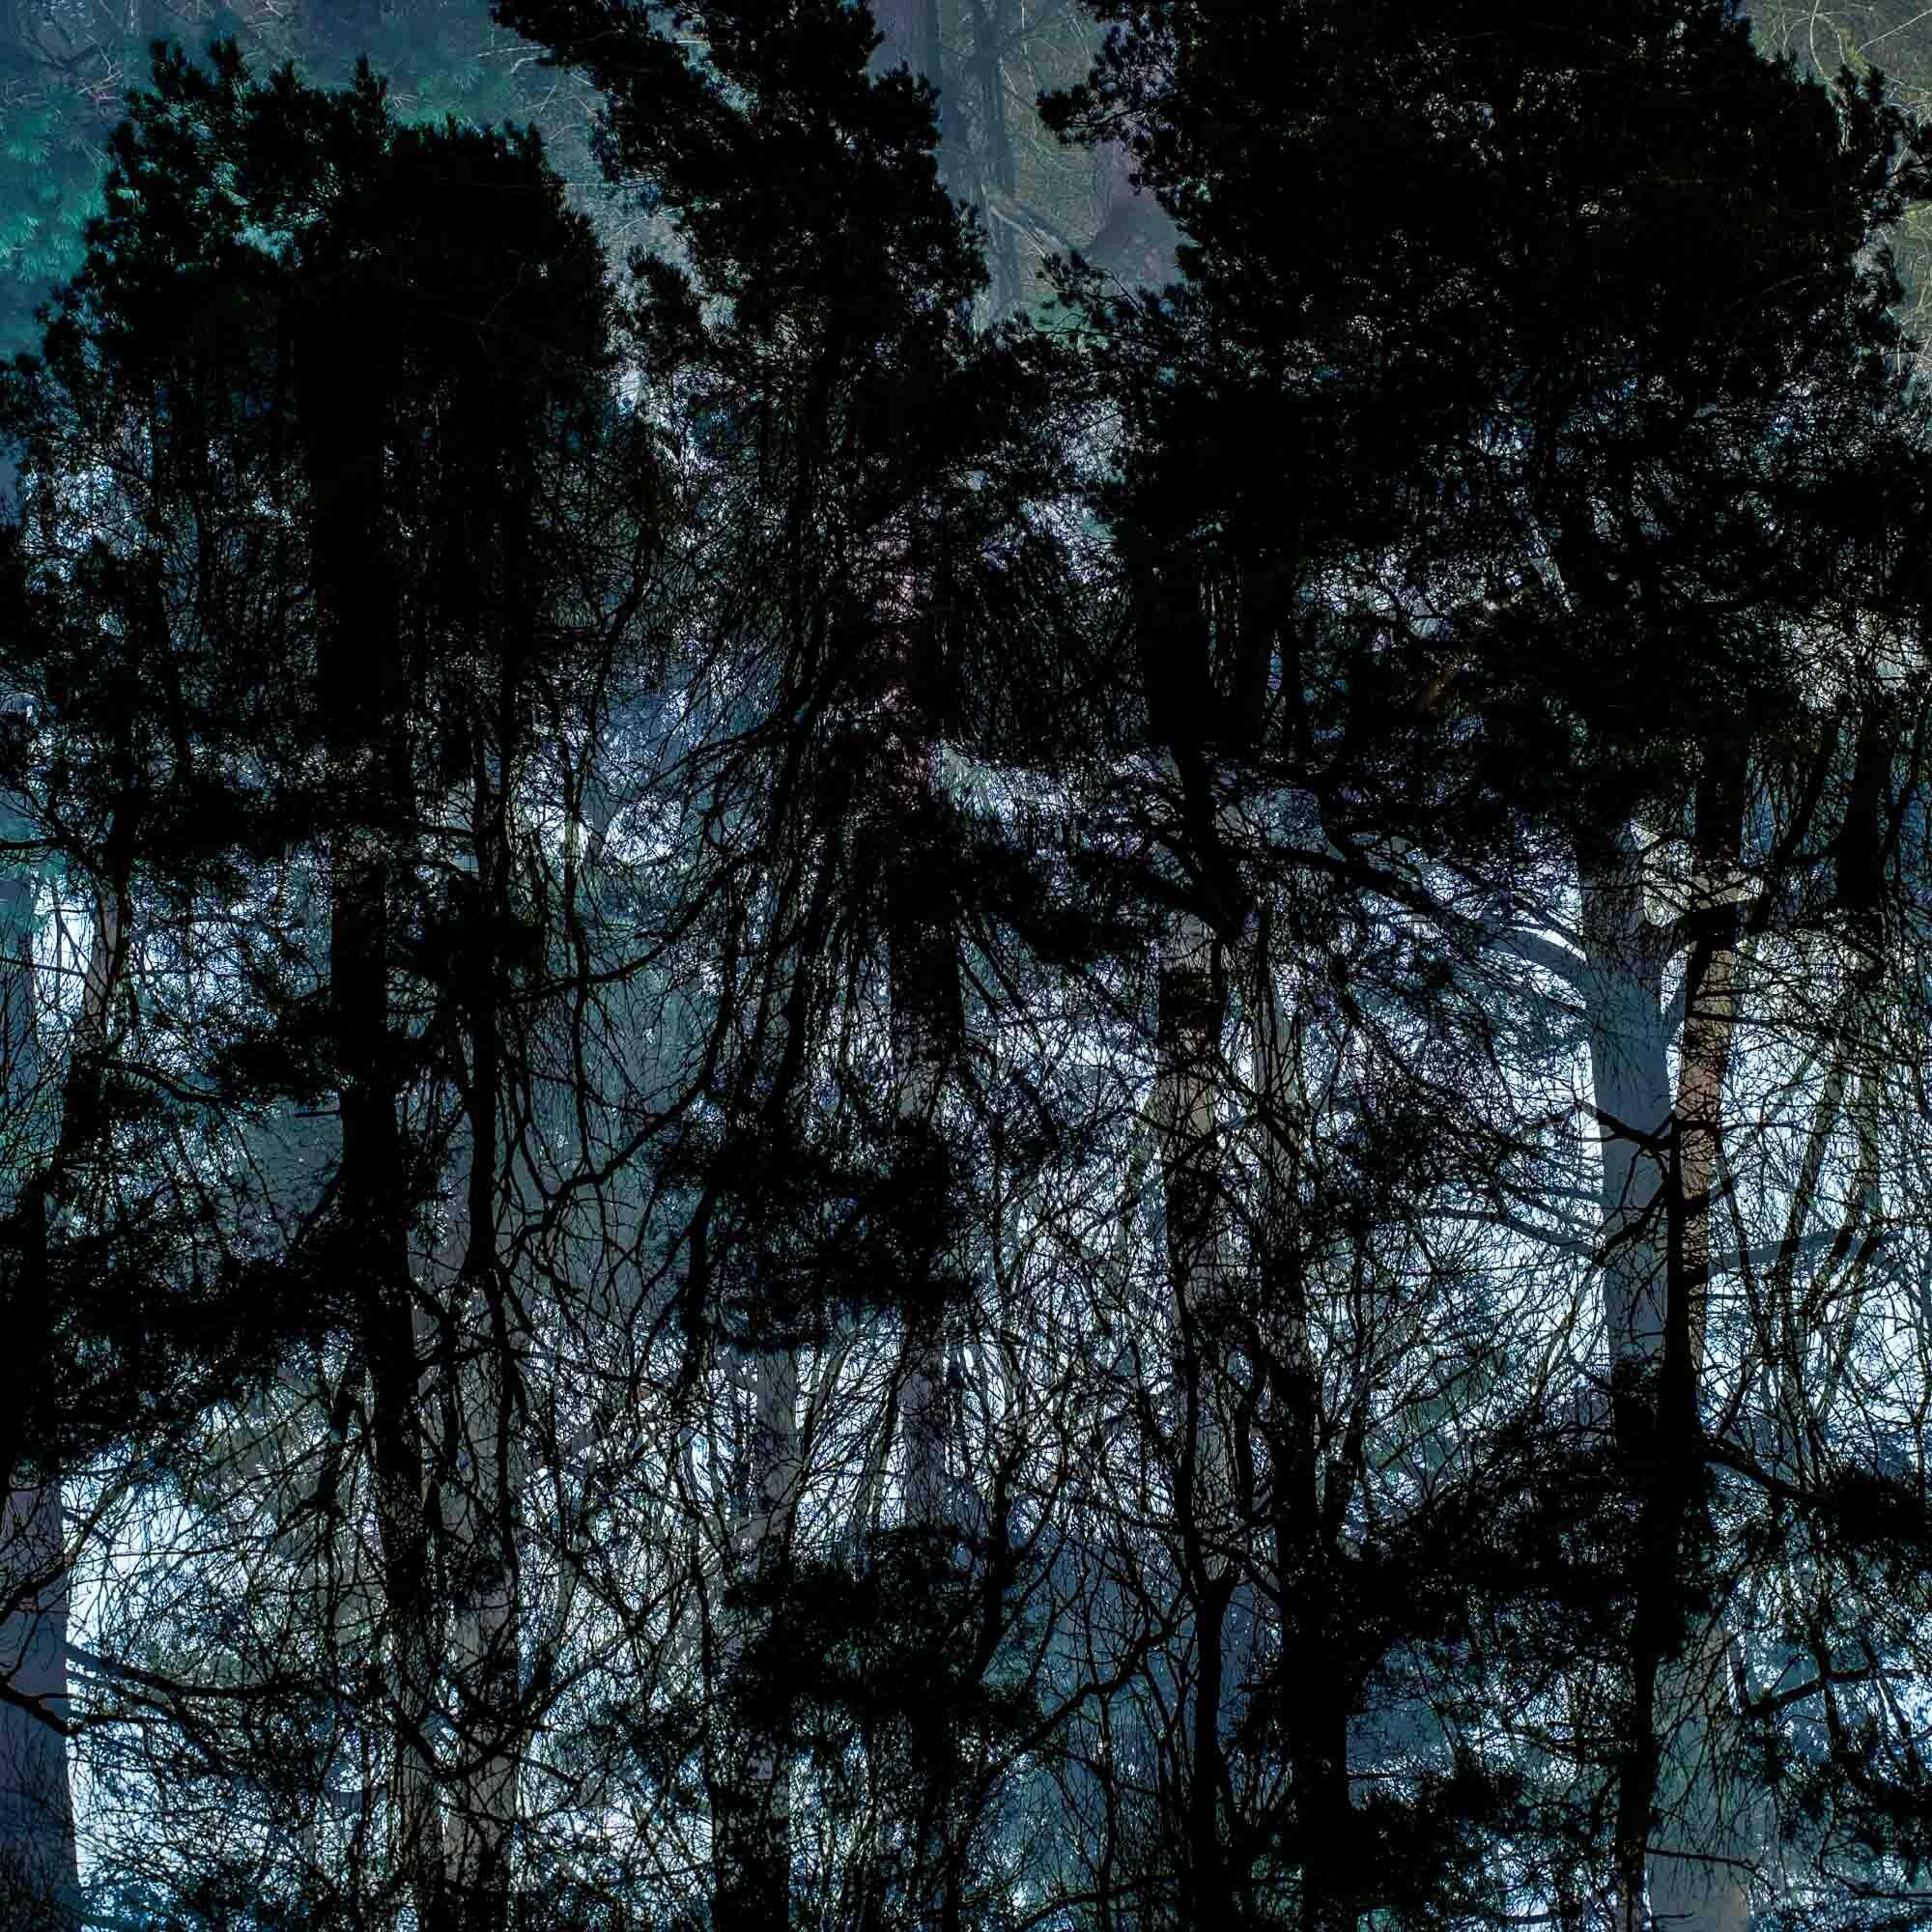 Tall pines_.jpg